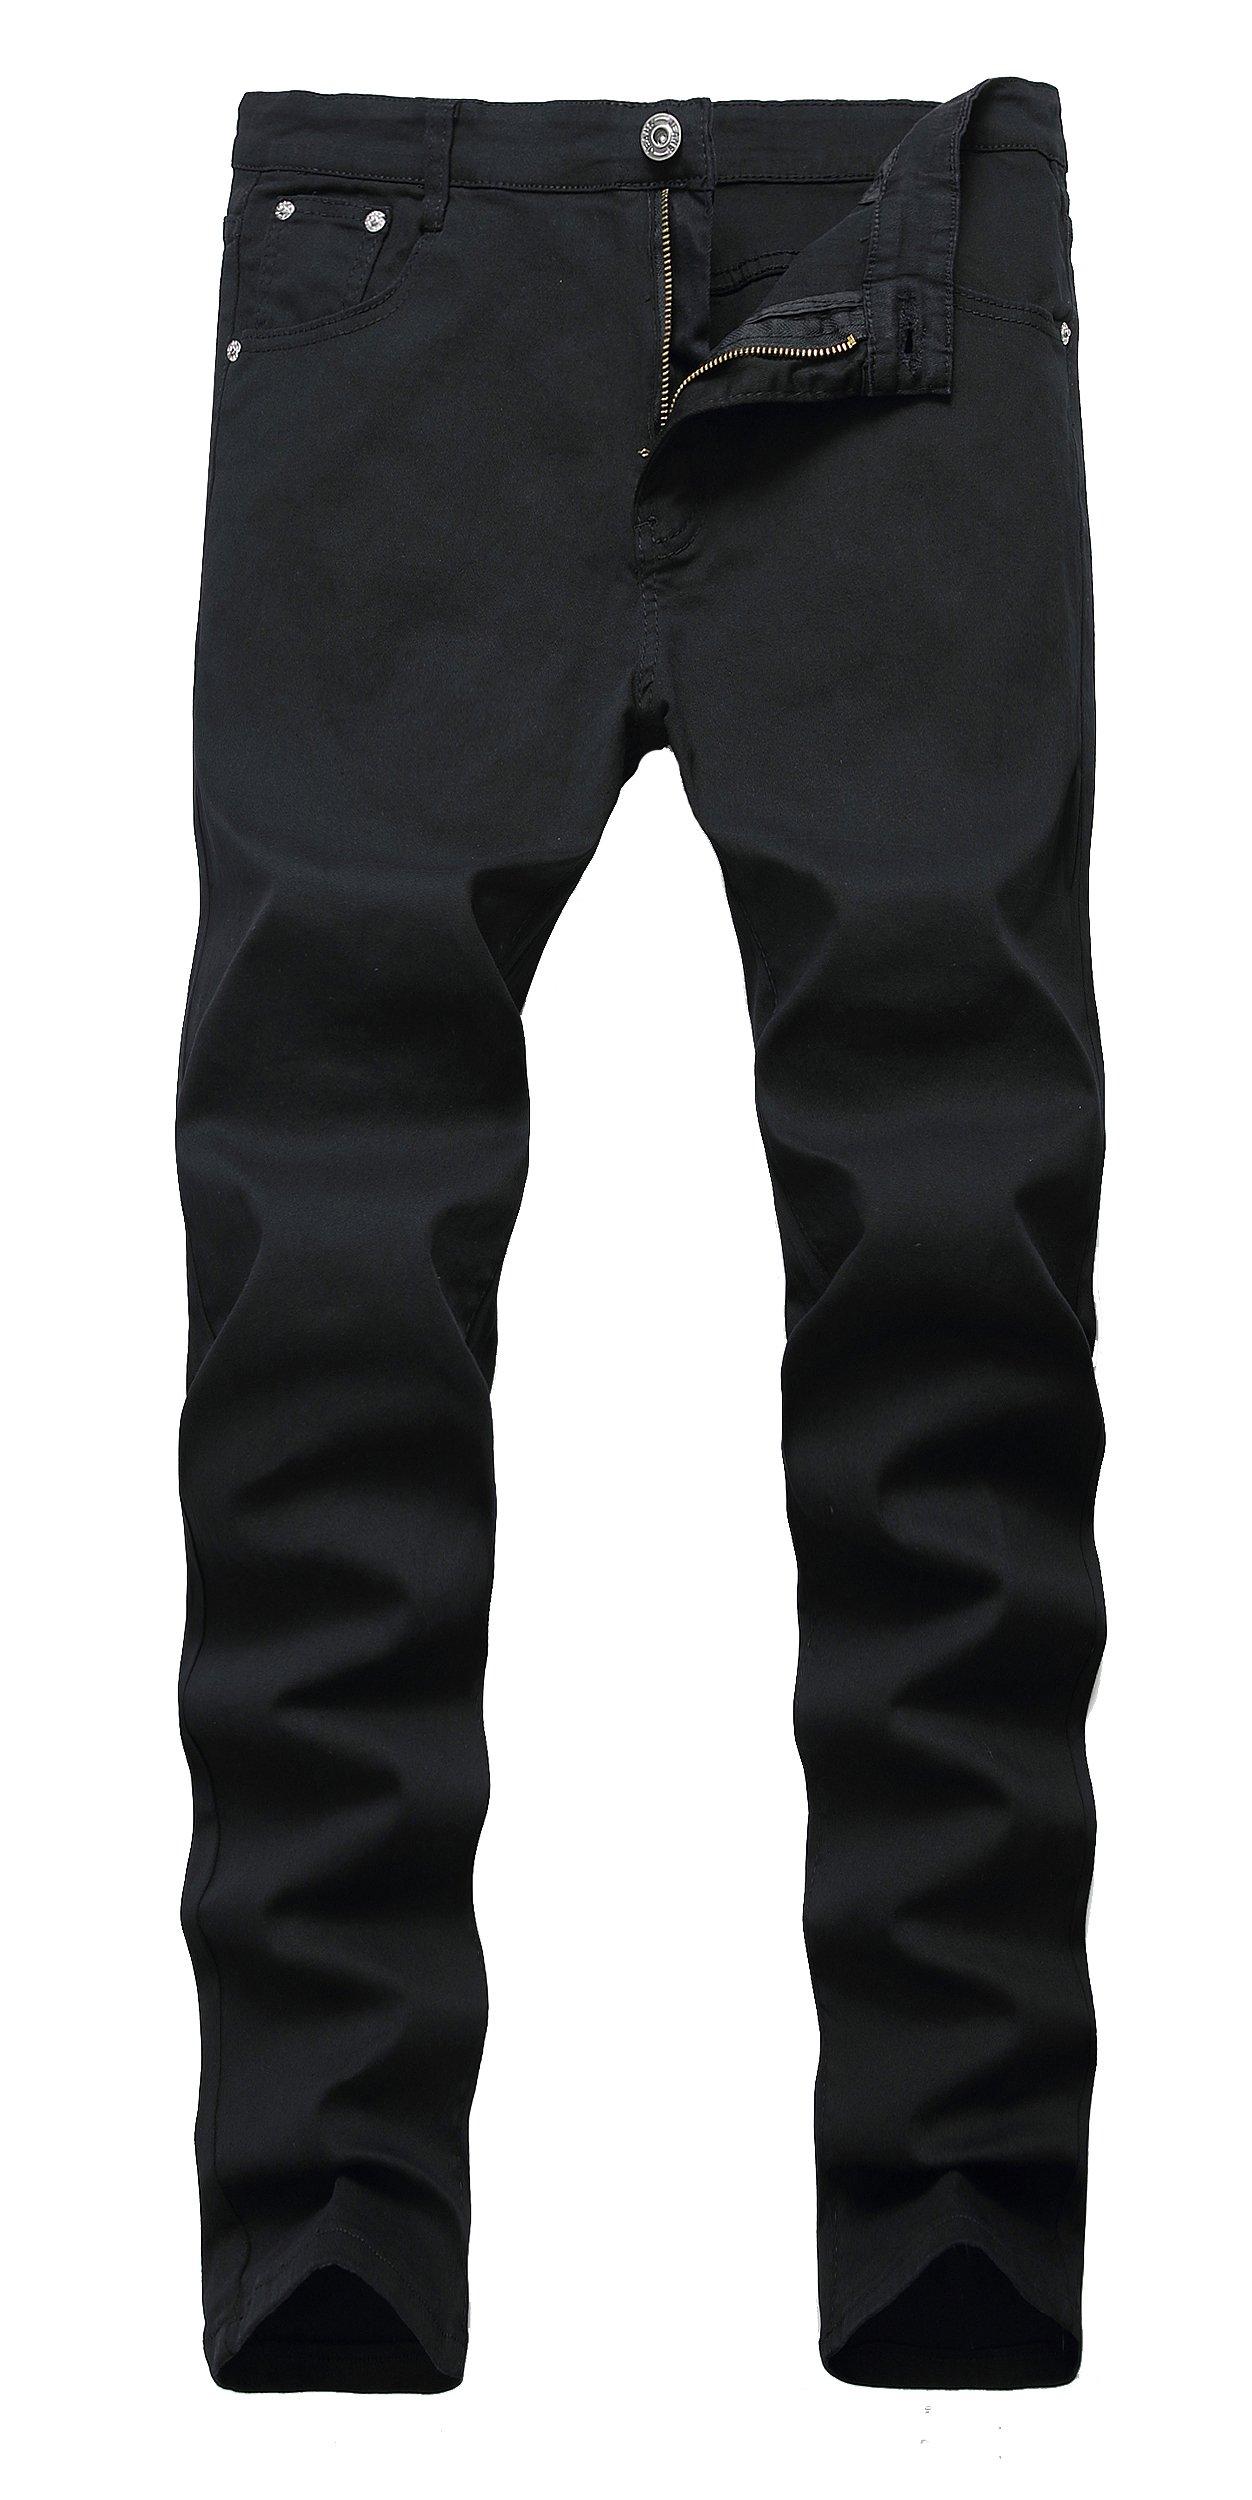 Qazel Vorrlon Men's Light Blue Skinny Ripped Jeans Destroyed Distressed Pencil Pants Black,Size 36